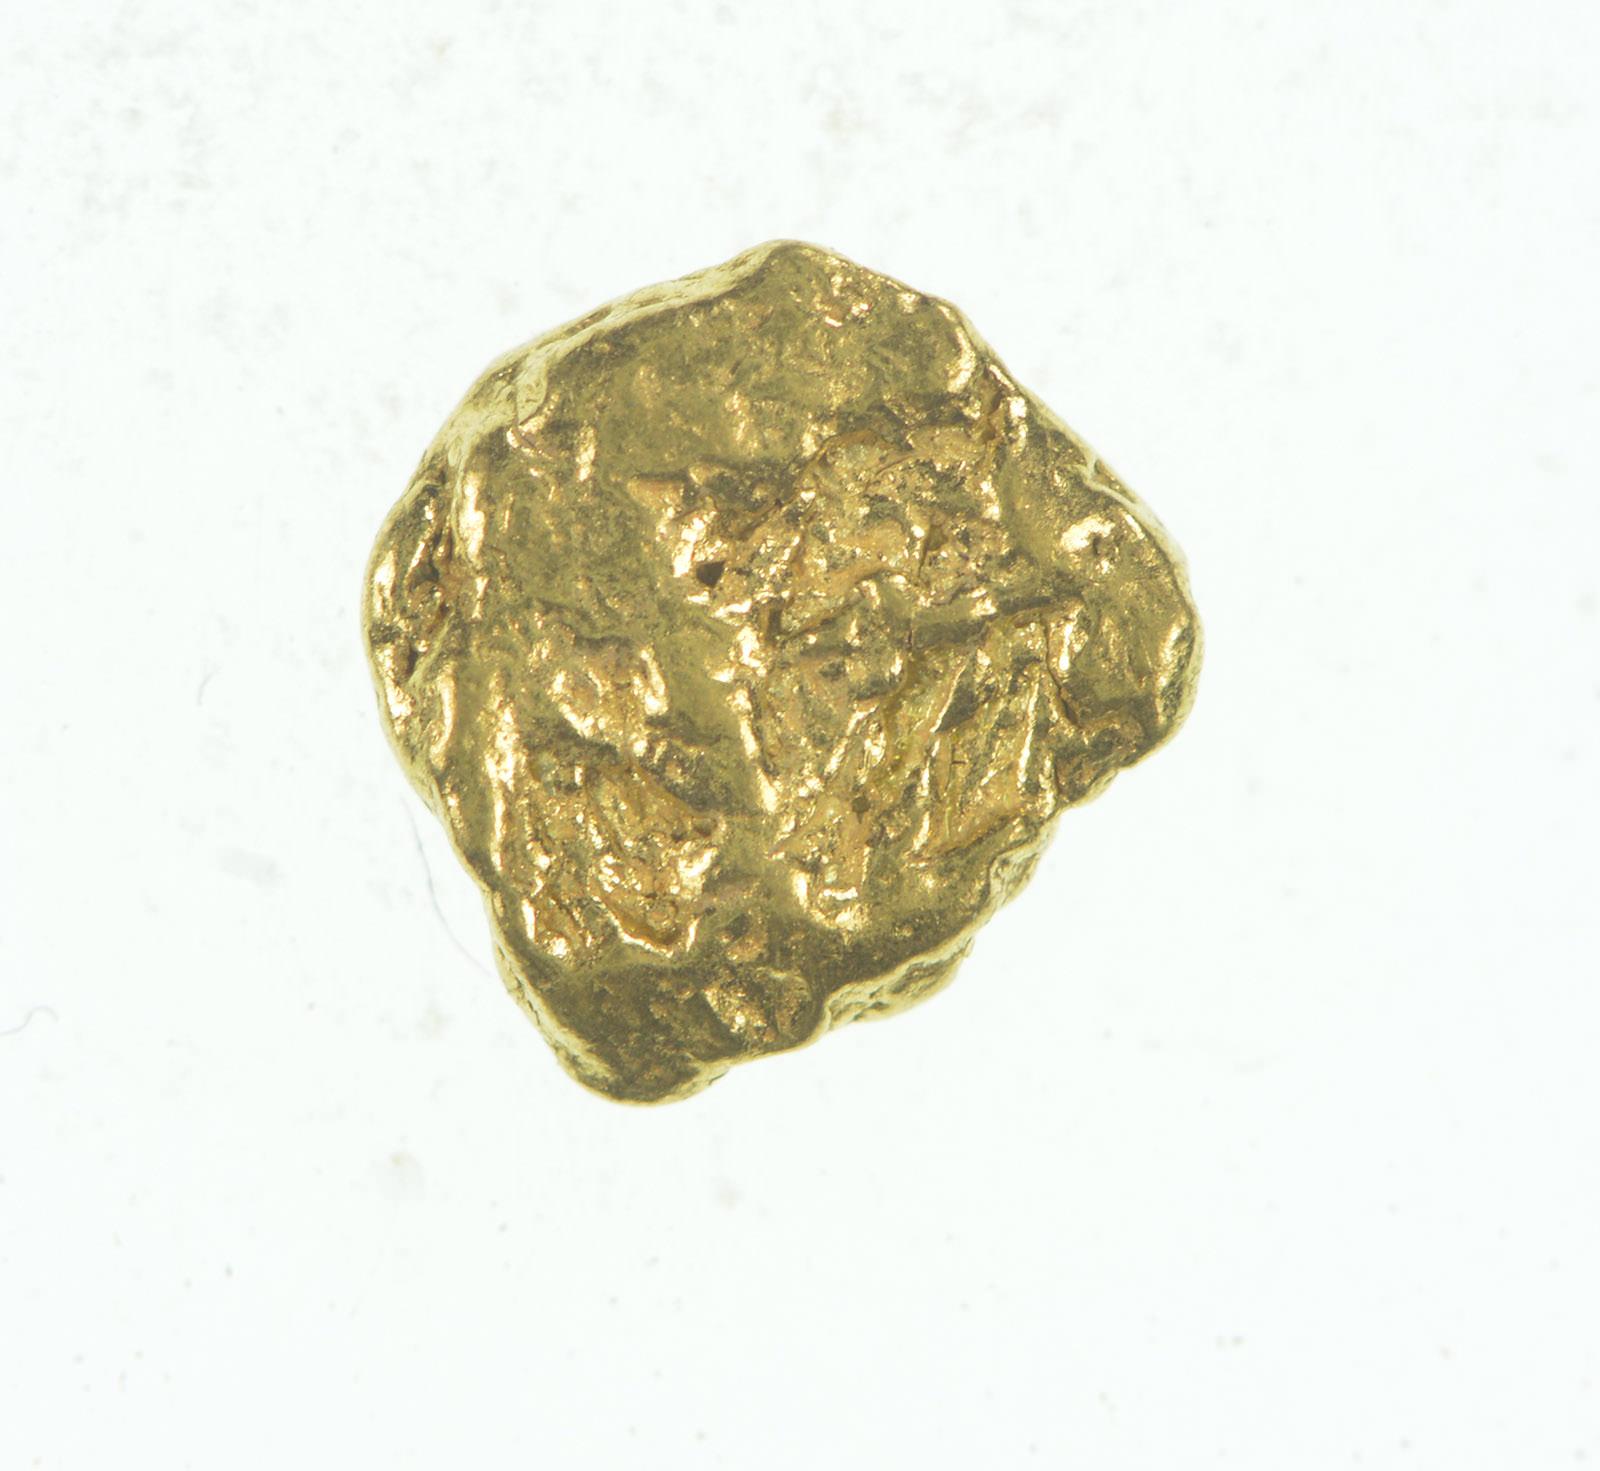 Gold Rush - Idaho Gold Nugget - Raw High Karat - 0 6g